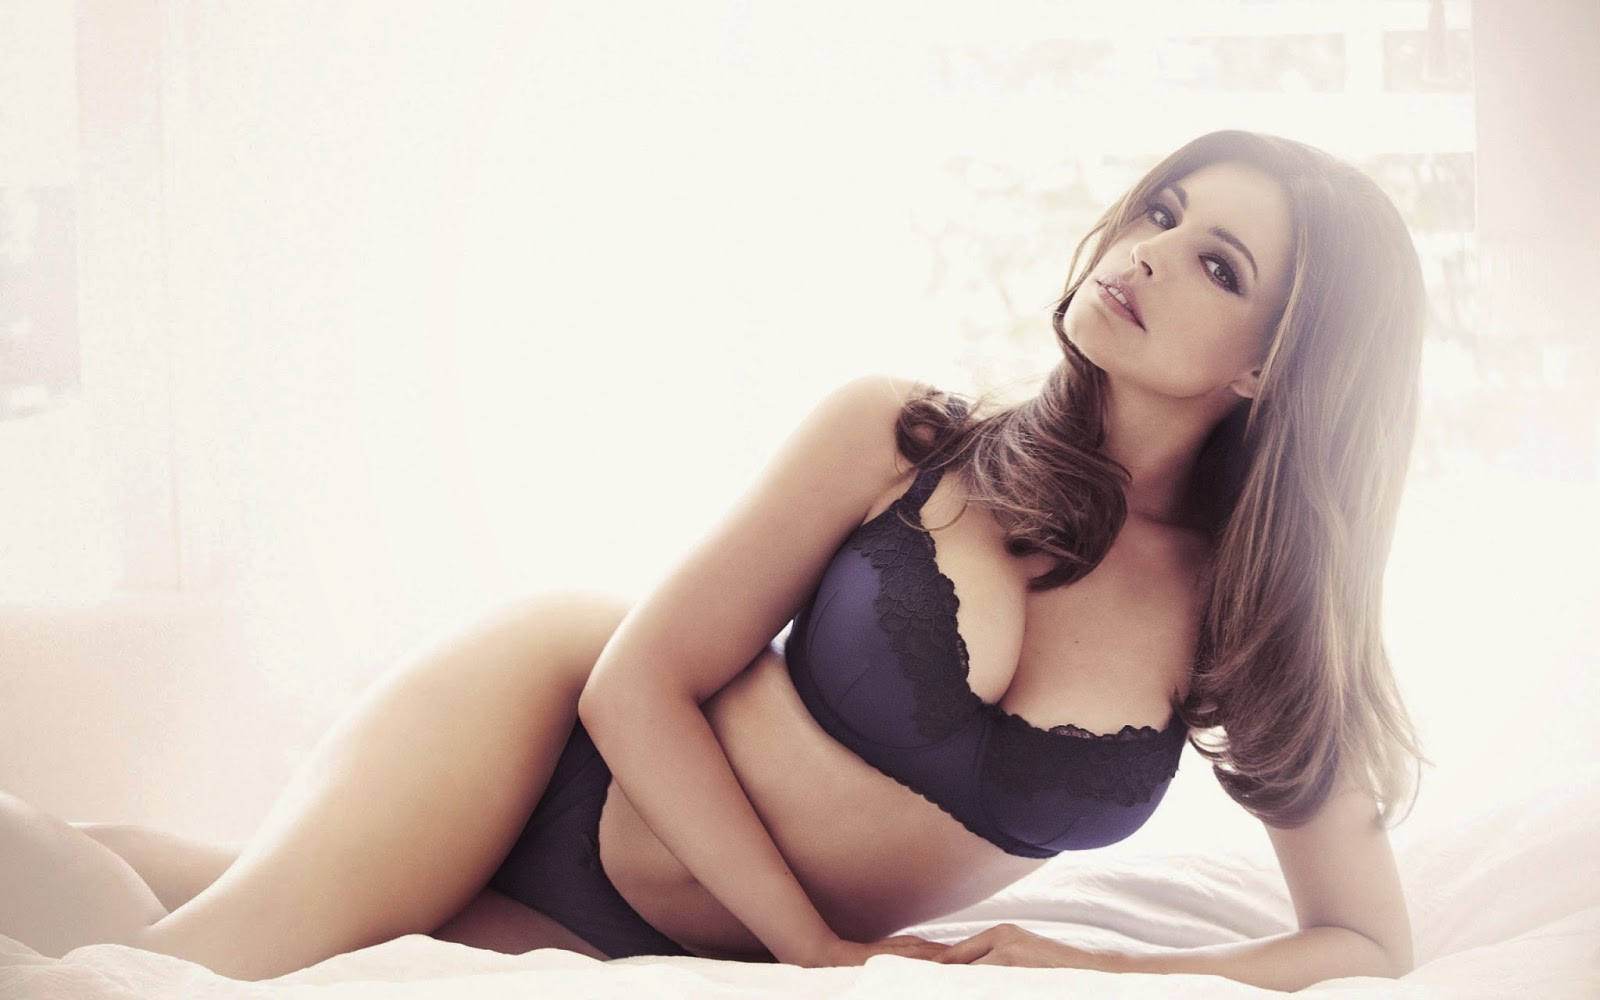 Girls Hd Wallpapers Sexy Models Boobs Tits Ass Xxx Adult -8111